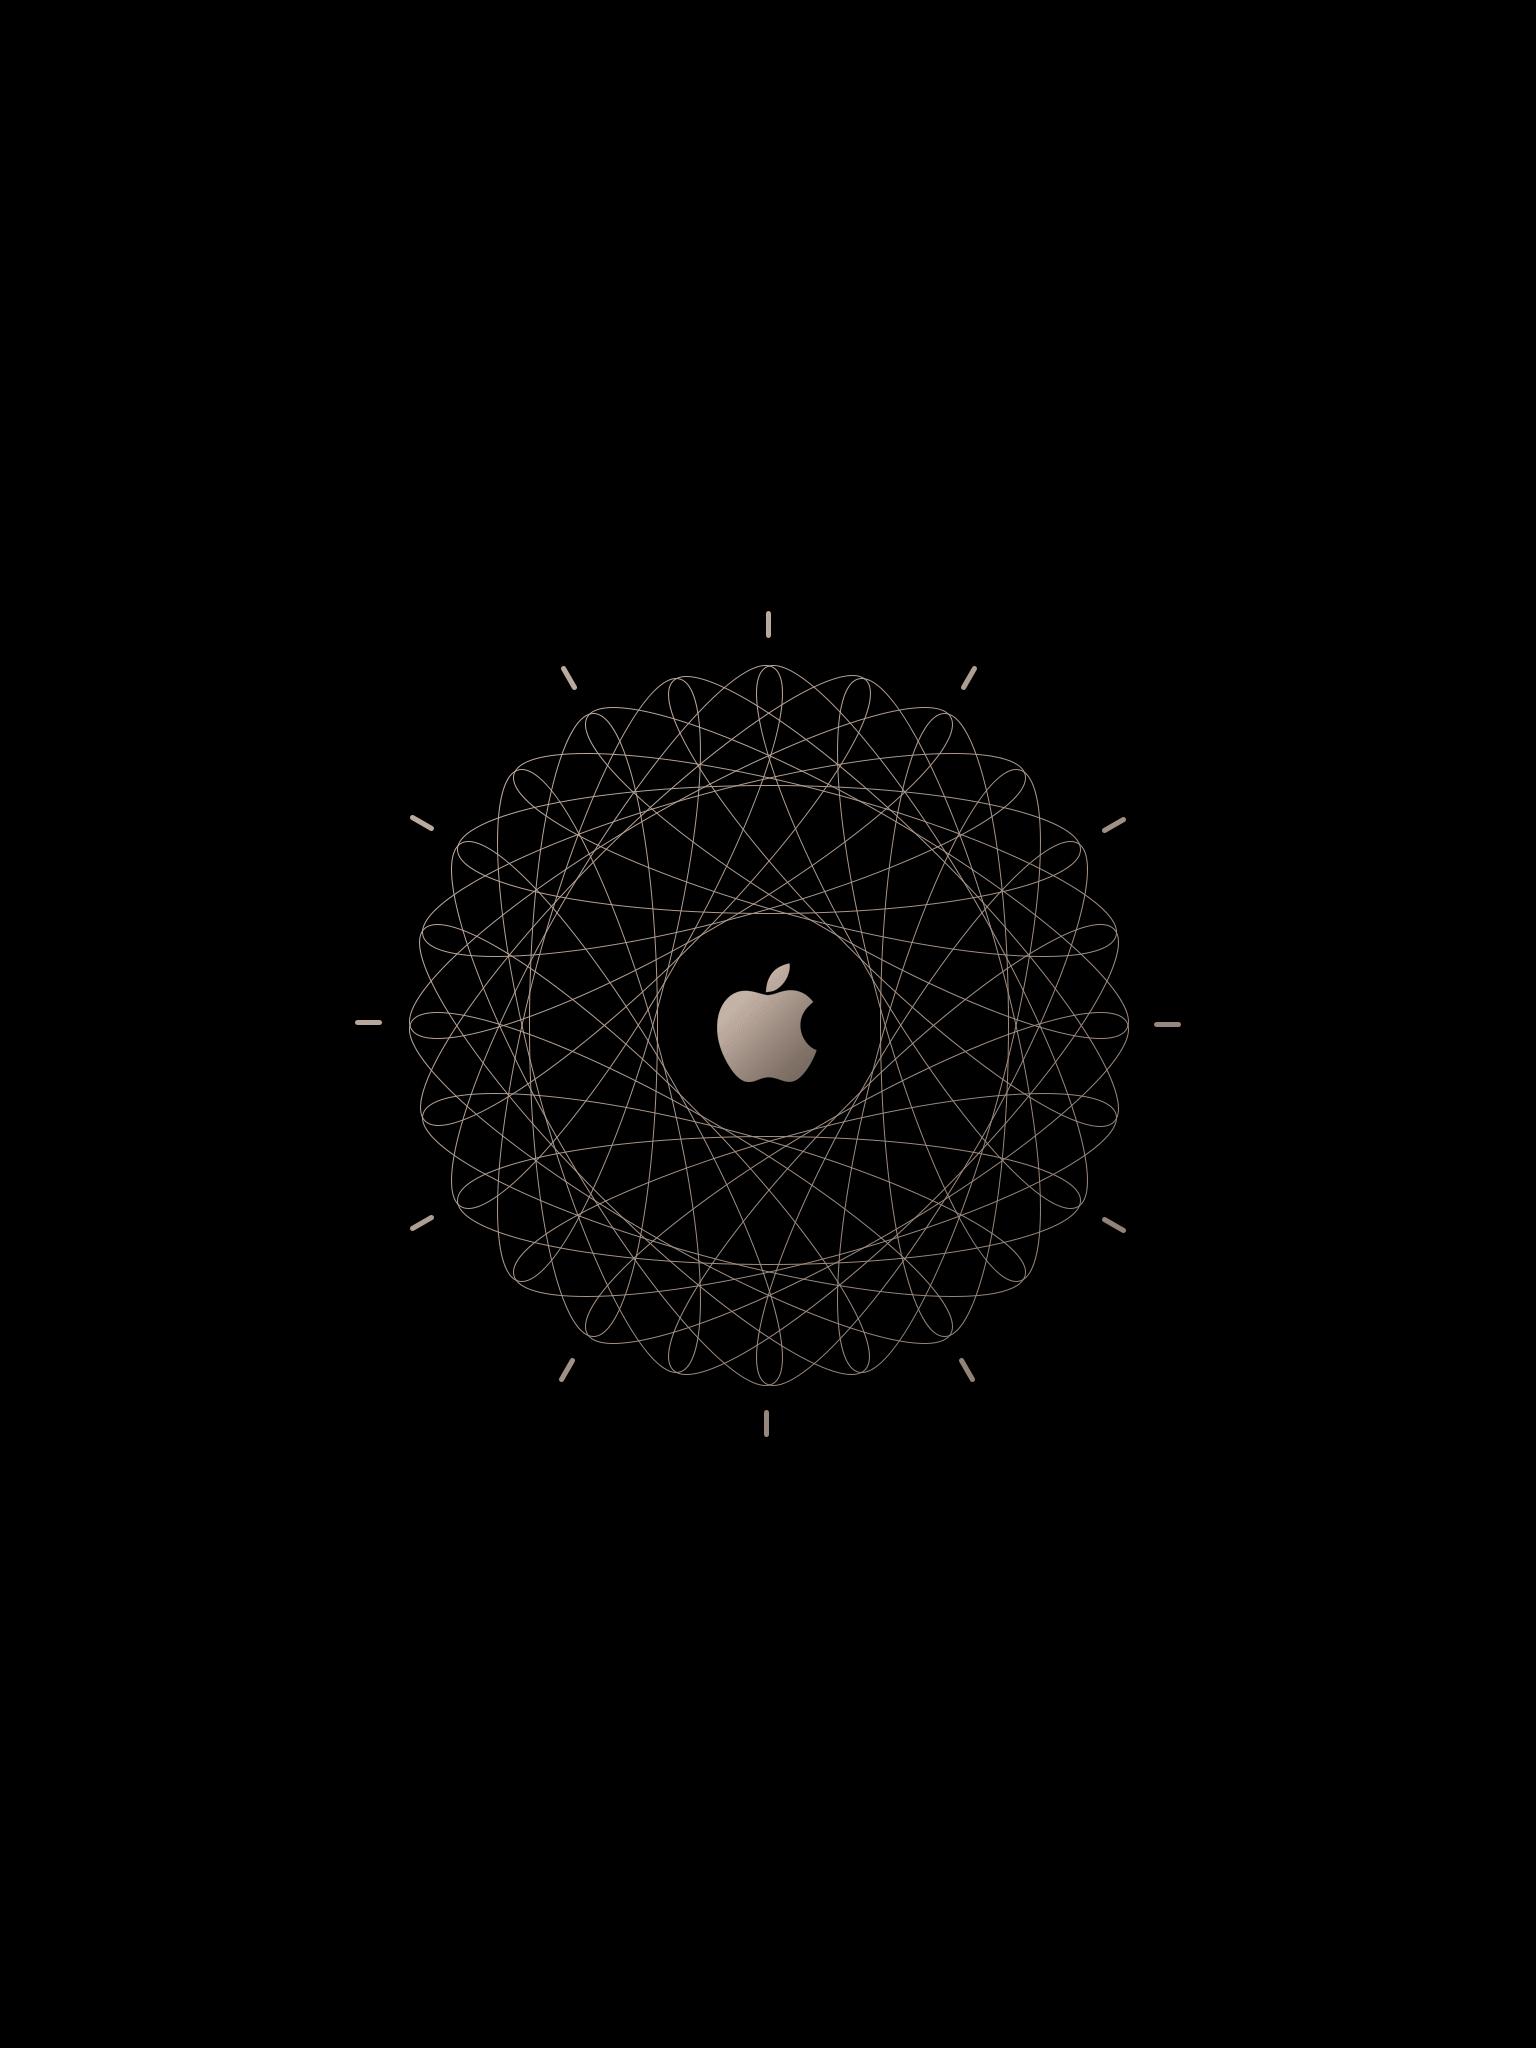 wallpaper ipad retina apple watch blanco | ipadmini | pinterest